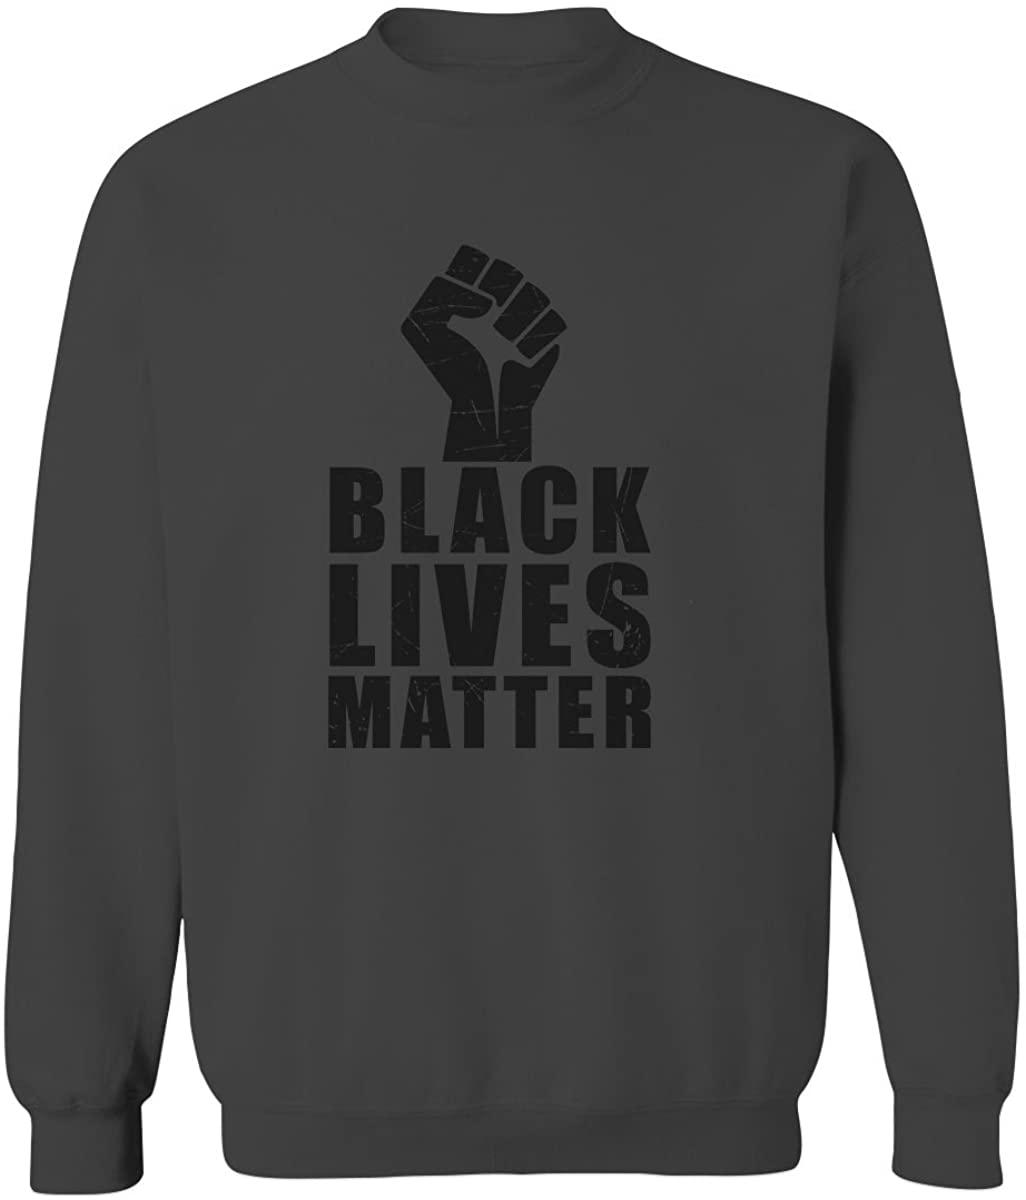 Black Lives Matter Liberal Progressive Protest Nevertheless Resist Men's Crewneck Sweatshirt